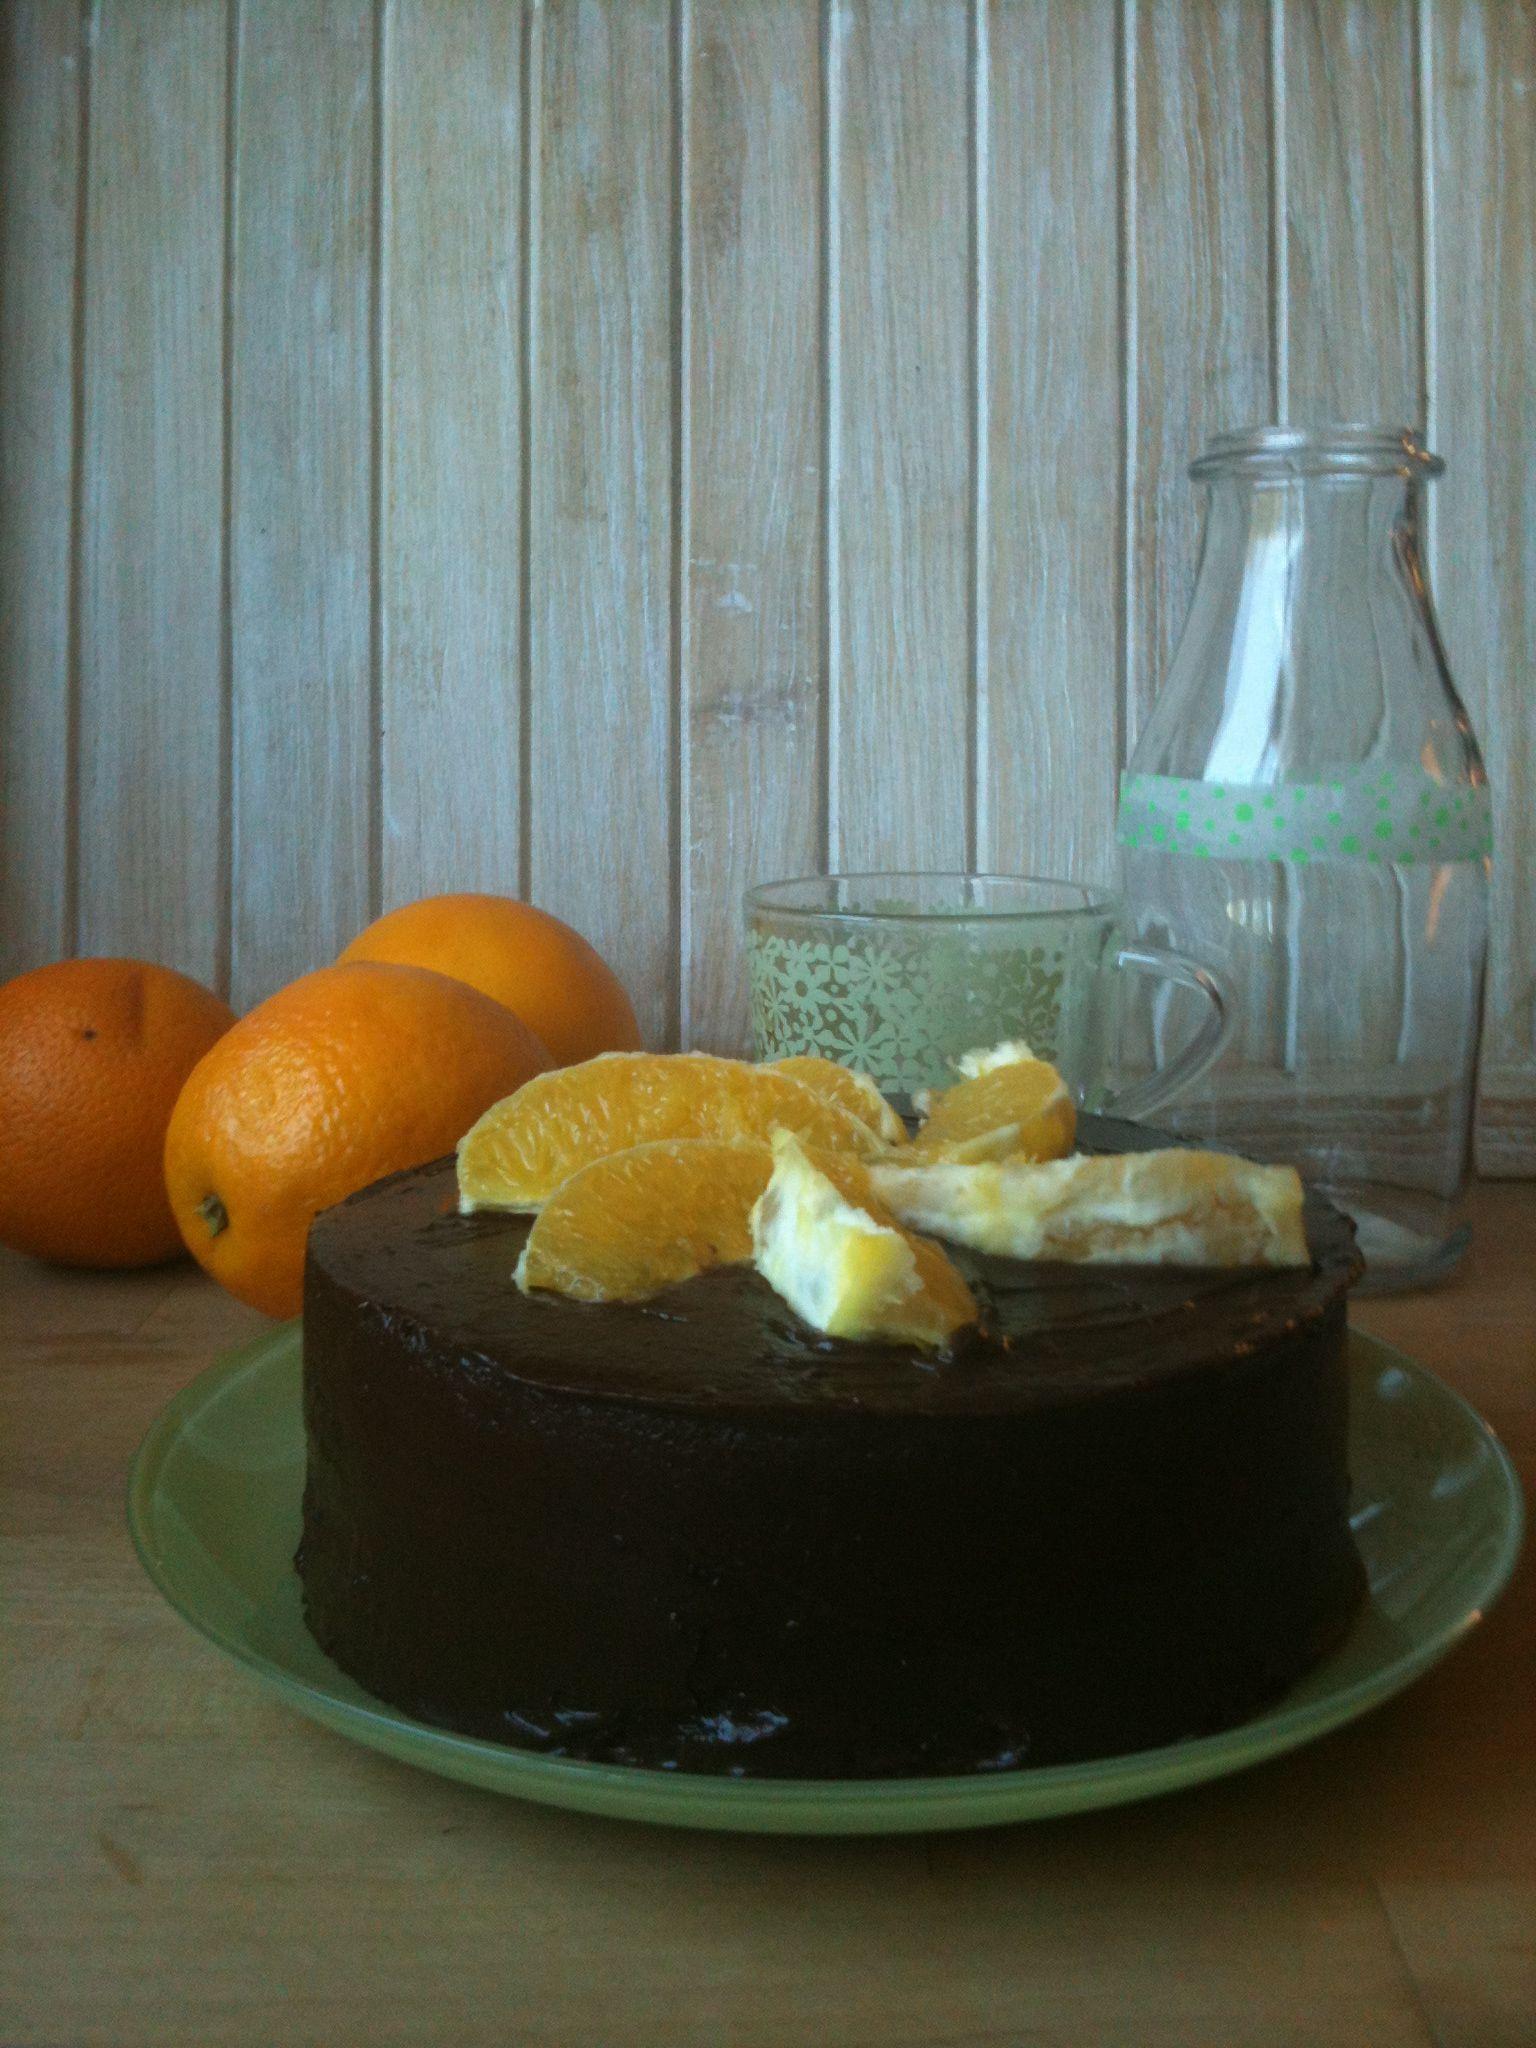 Tarta de naranja y ganache de chocolate negro